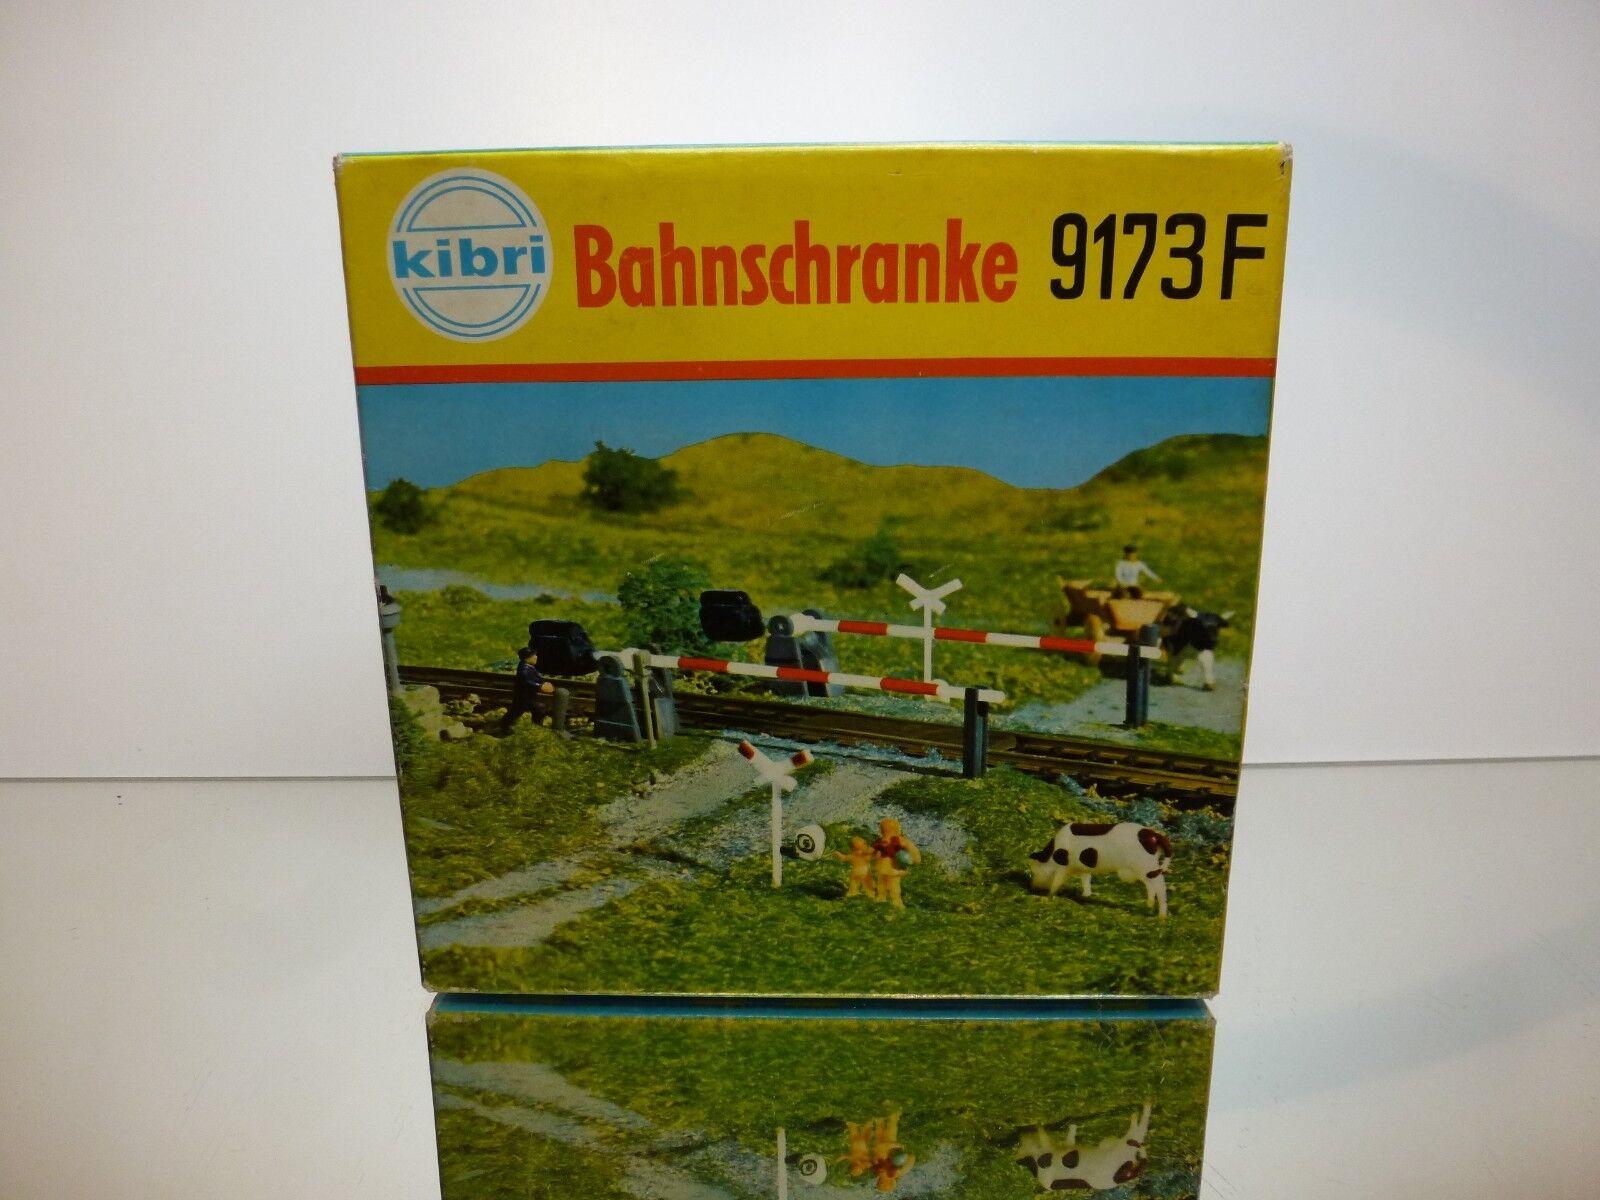 ventas en linea KIBRI 9175F 9175F 9175F BAHNSCHRANKE RAILWAY CROSSING - L13.5cm - GOOD IN BOX  diseño simple y generoso